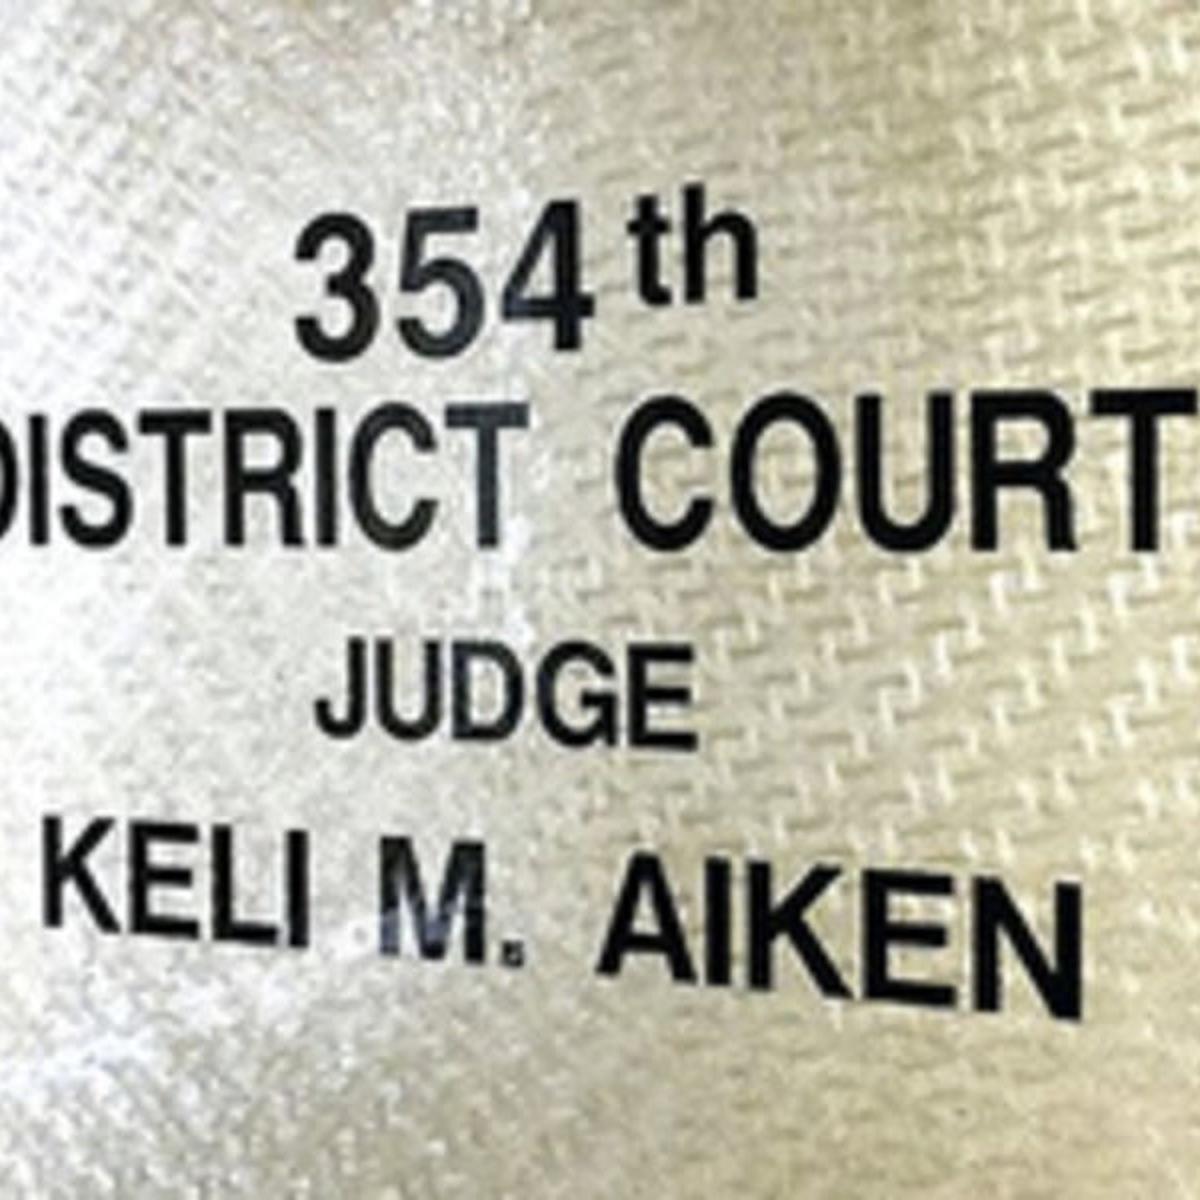 Trial reset in assault on officer case   News   heraldbanner com